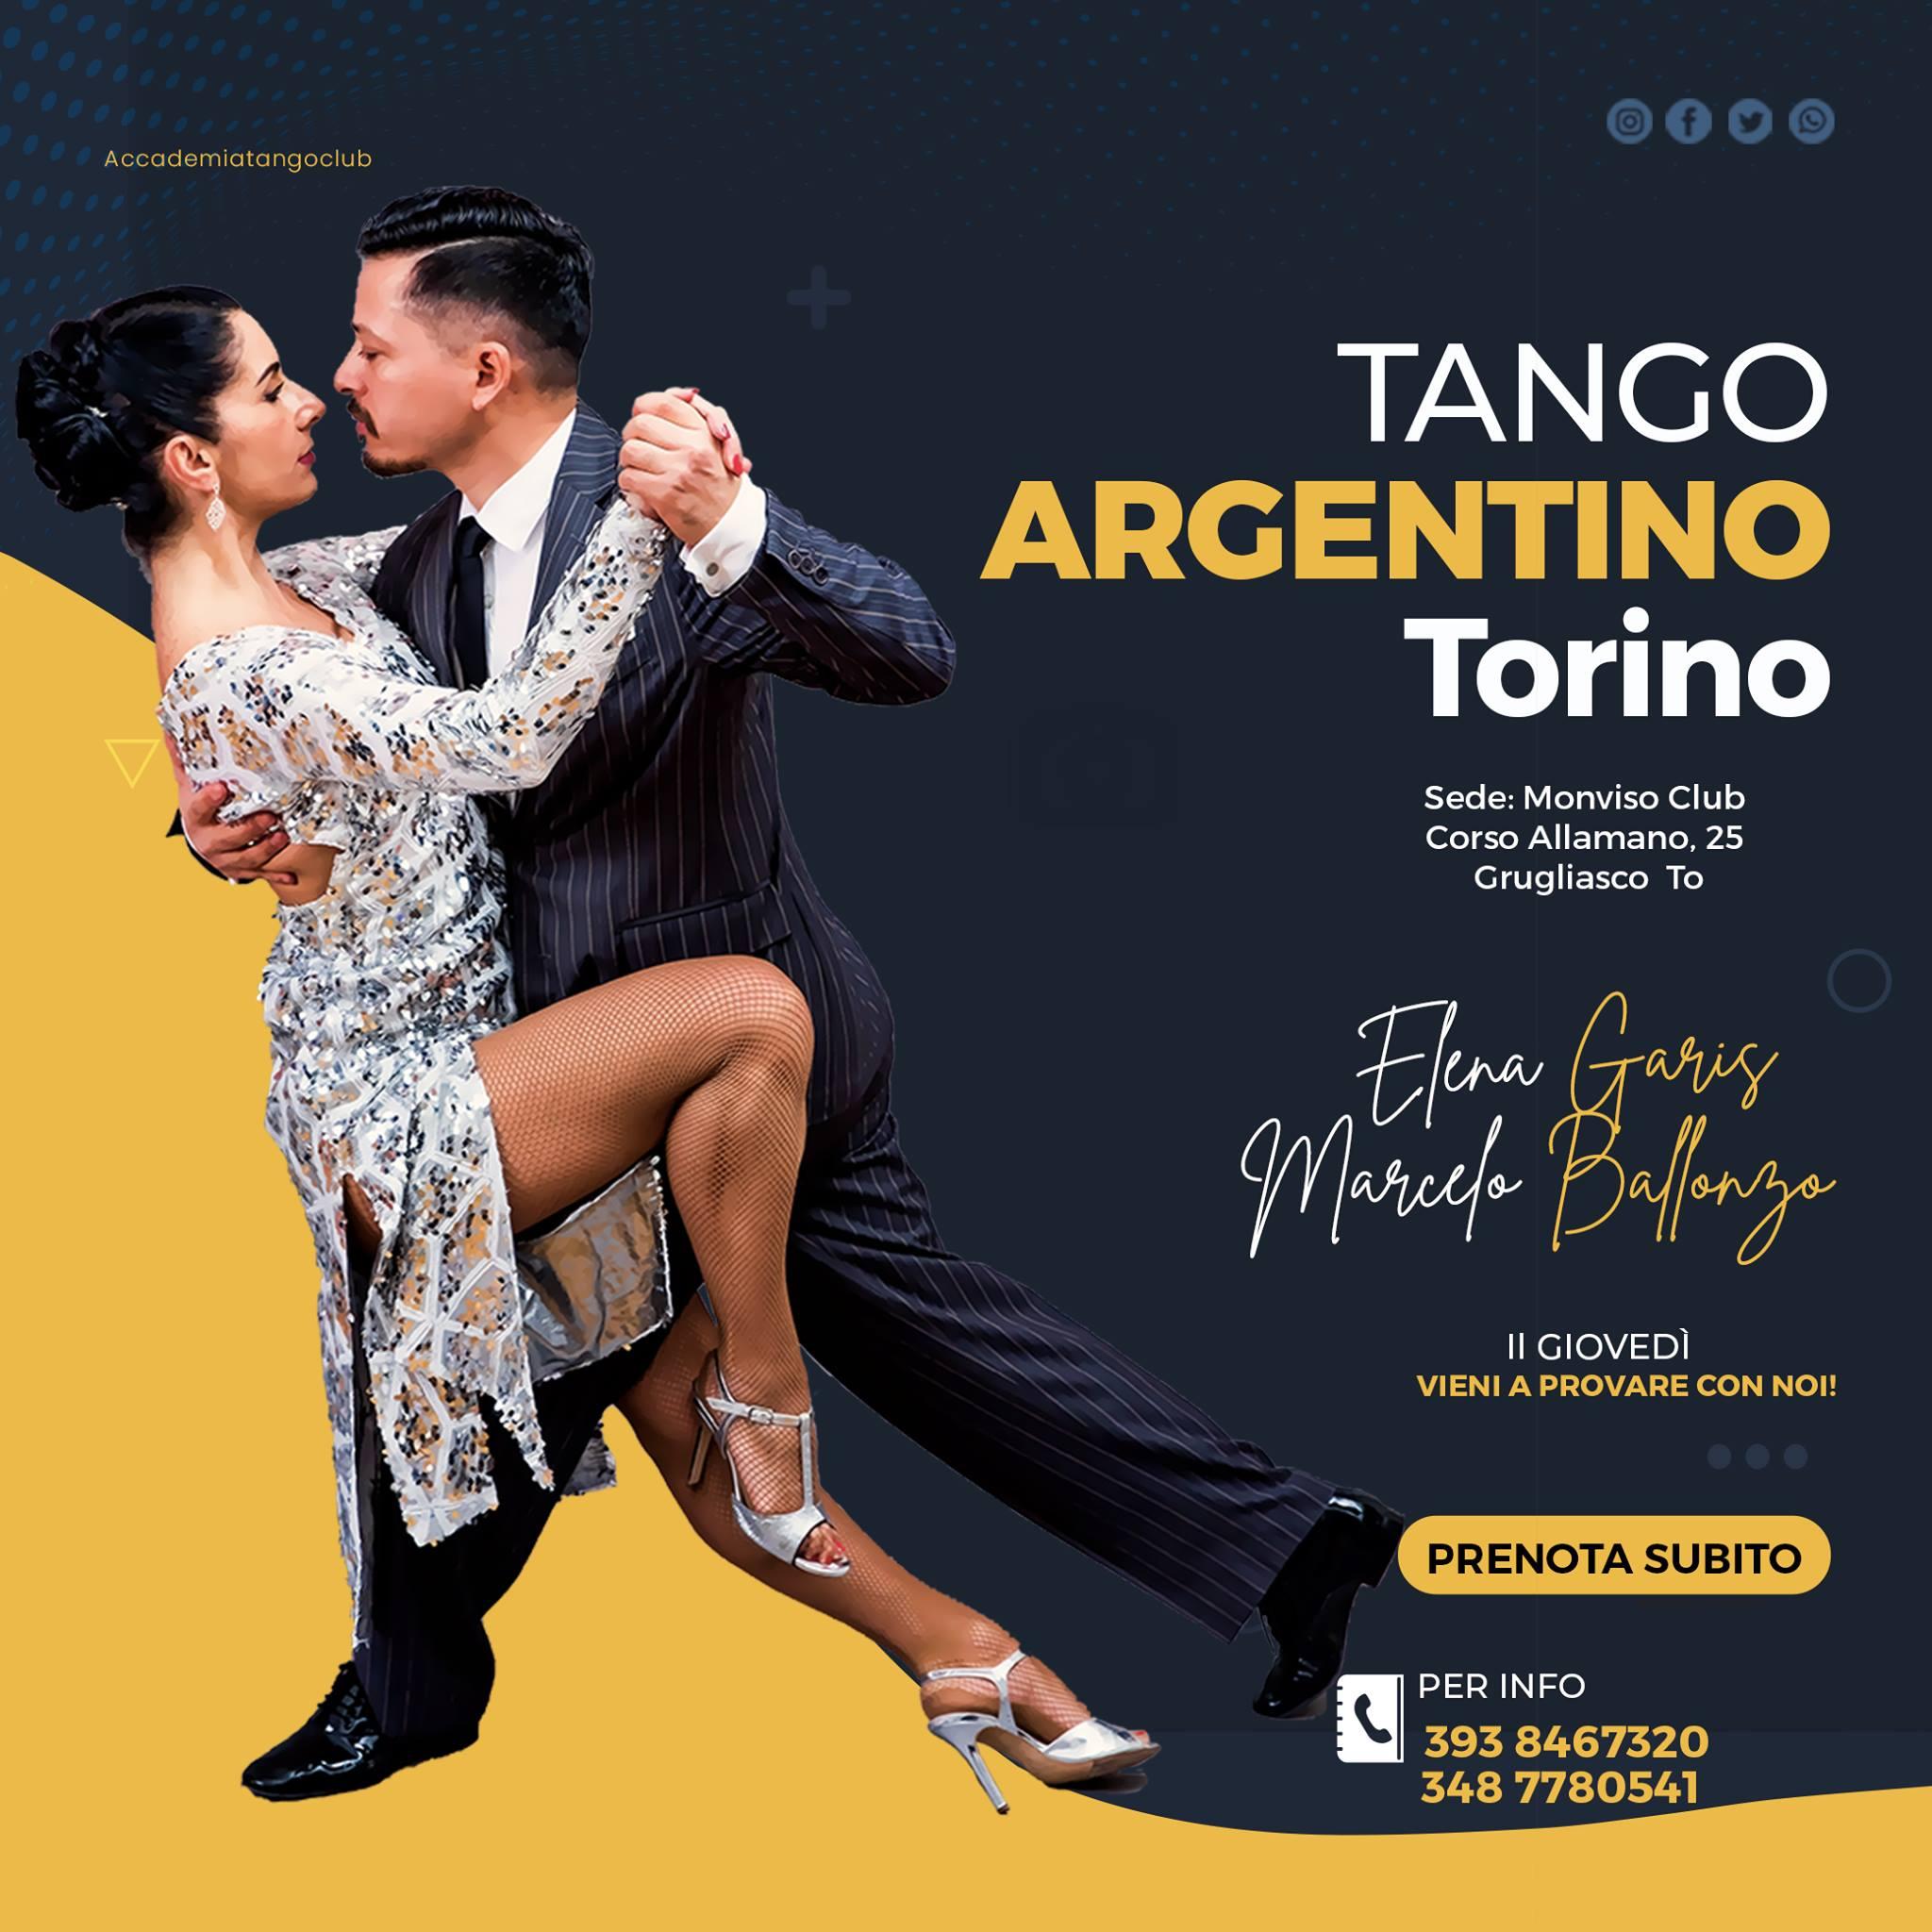 Accademia Tango Club asd